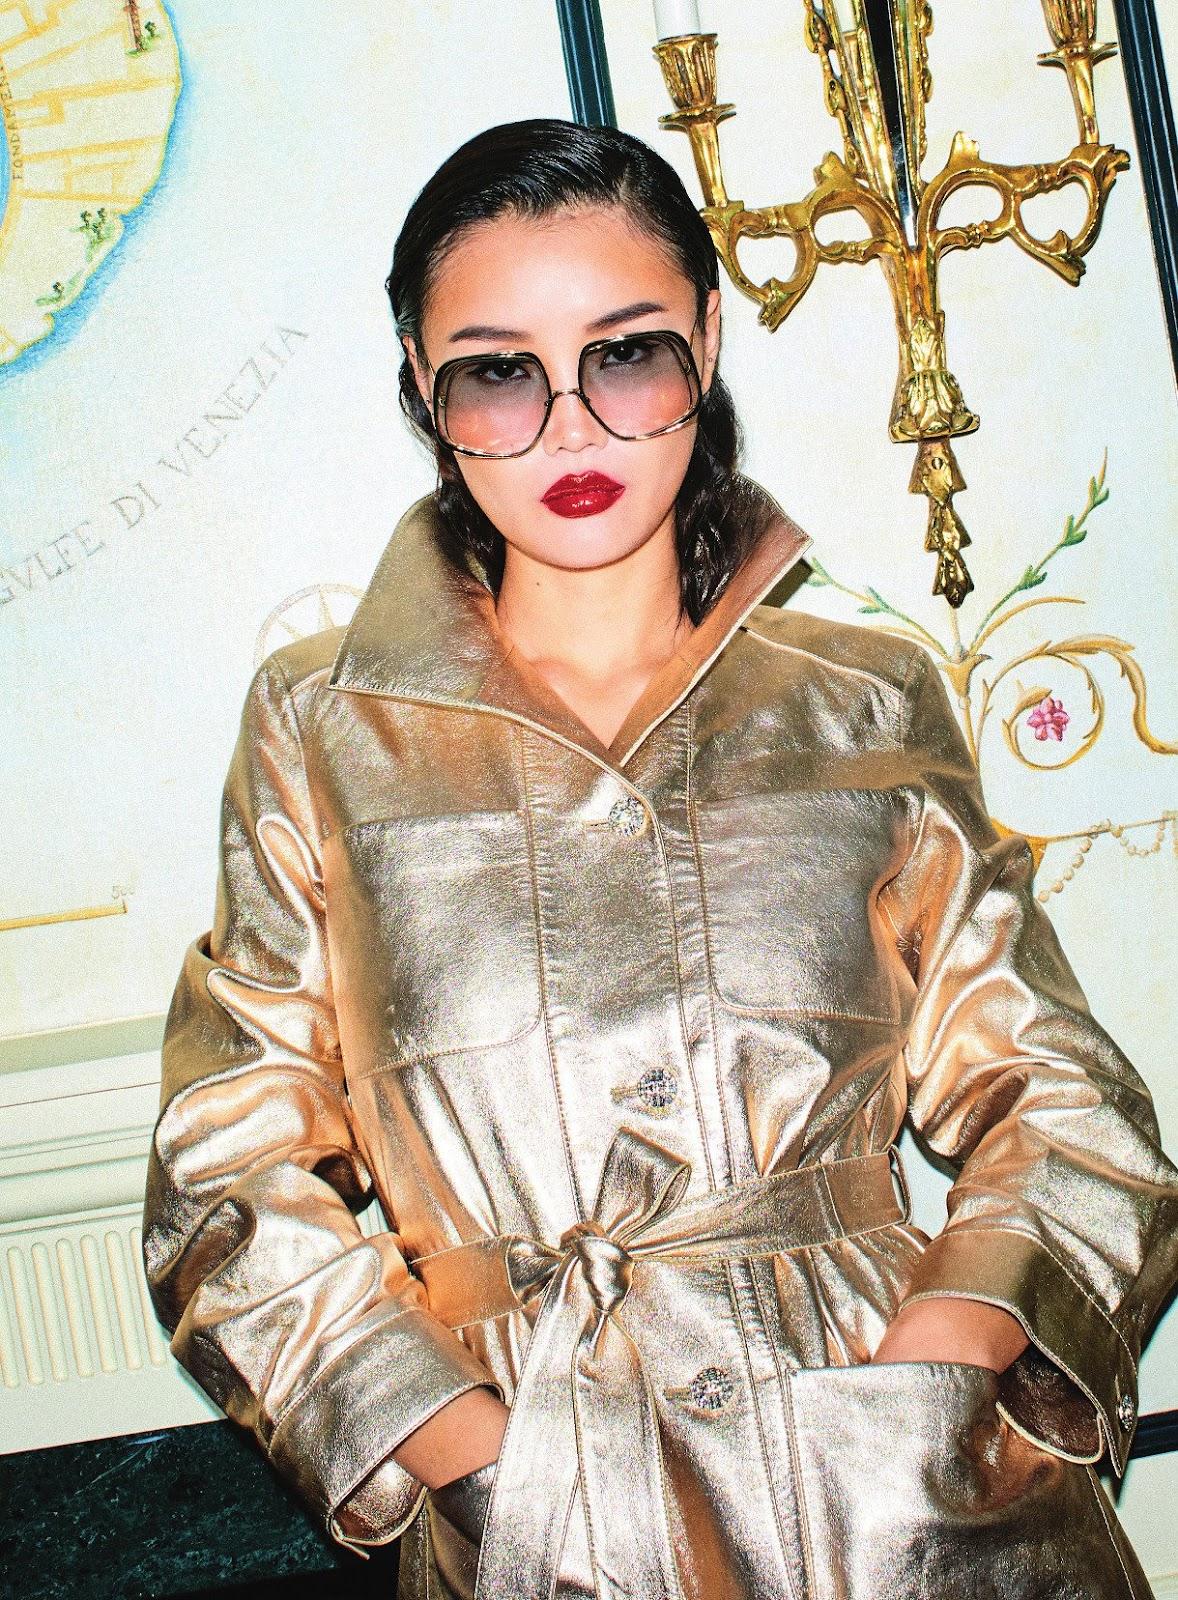 SMILE:Shumei Jiang in Stylist UK 8th September 2021 by Bella Howard